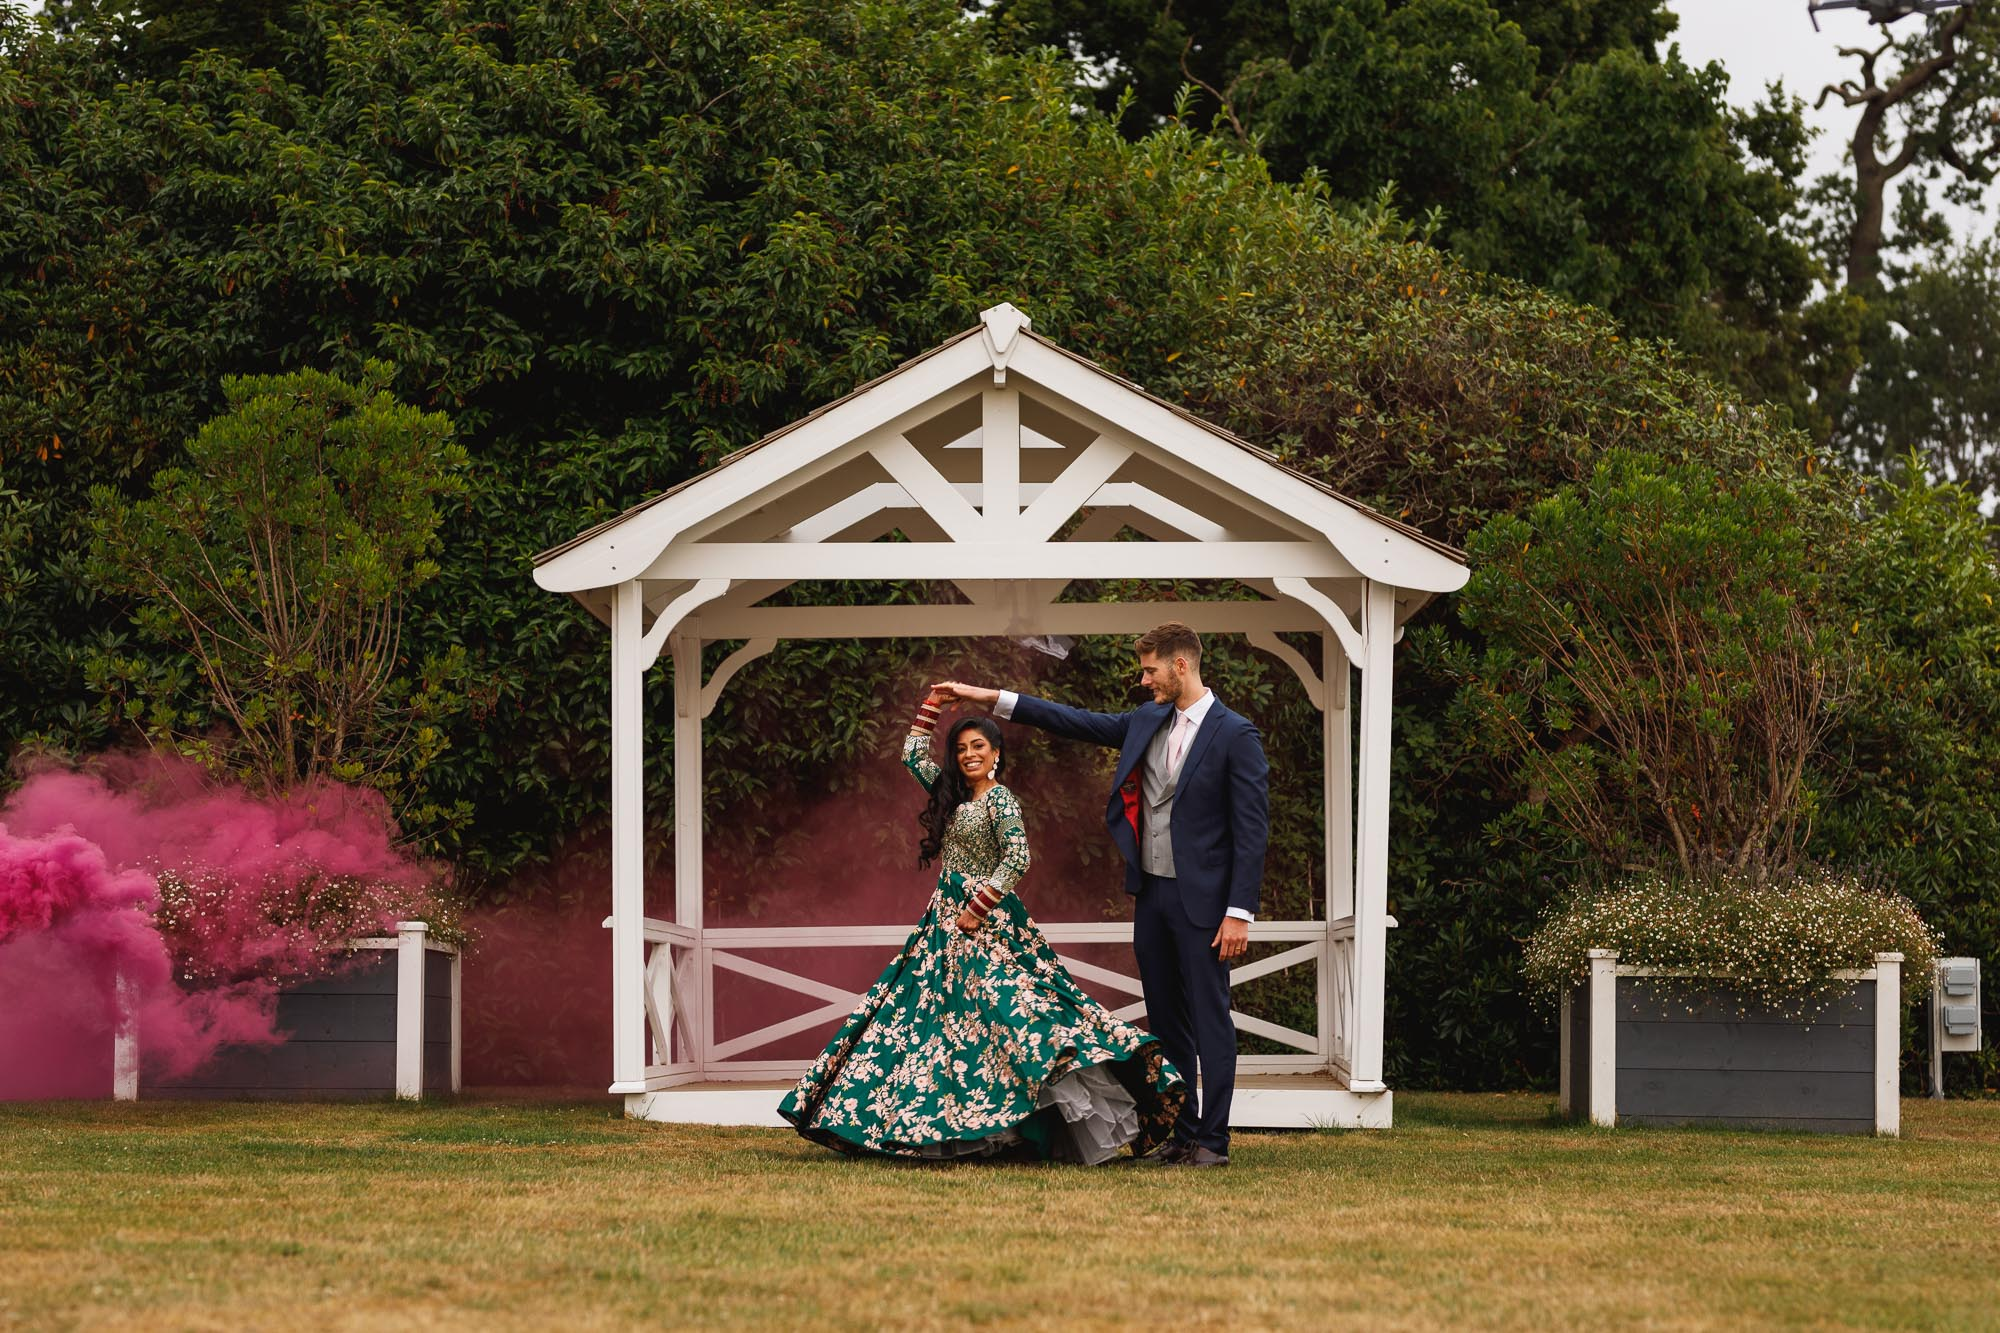 De Vere Wokefield Estate, Asian wedding photographer, reception, bride and groom portrait, smoke bomb, smoke grenades